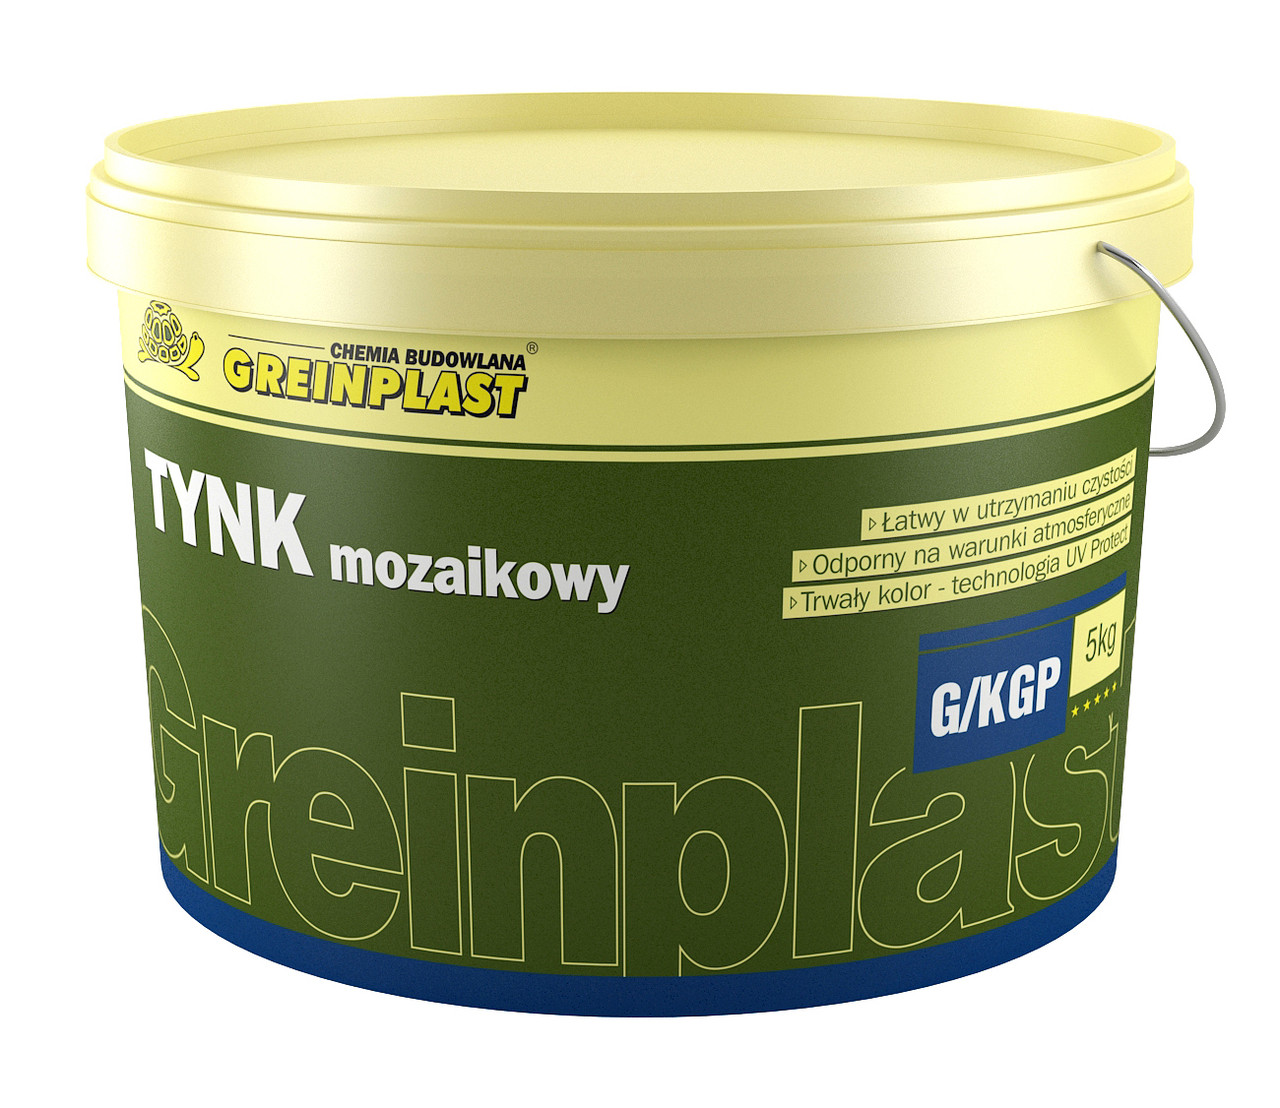 Мозаїчна штукатурка GREINPLAST G/KGP, мозаїка Грейнпласт 15 кг